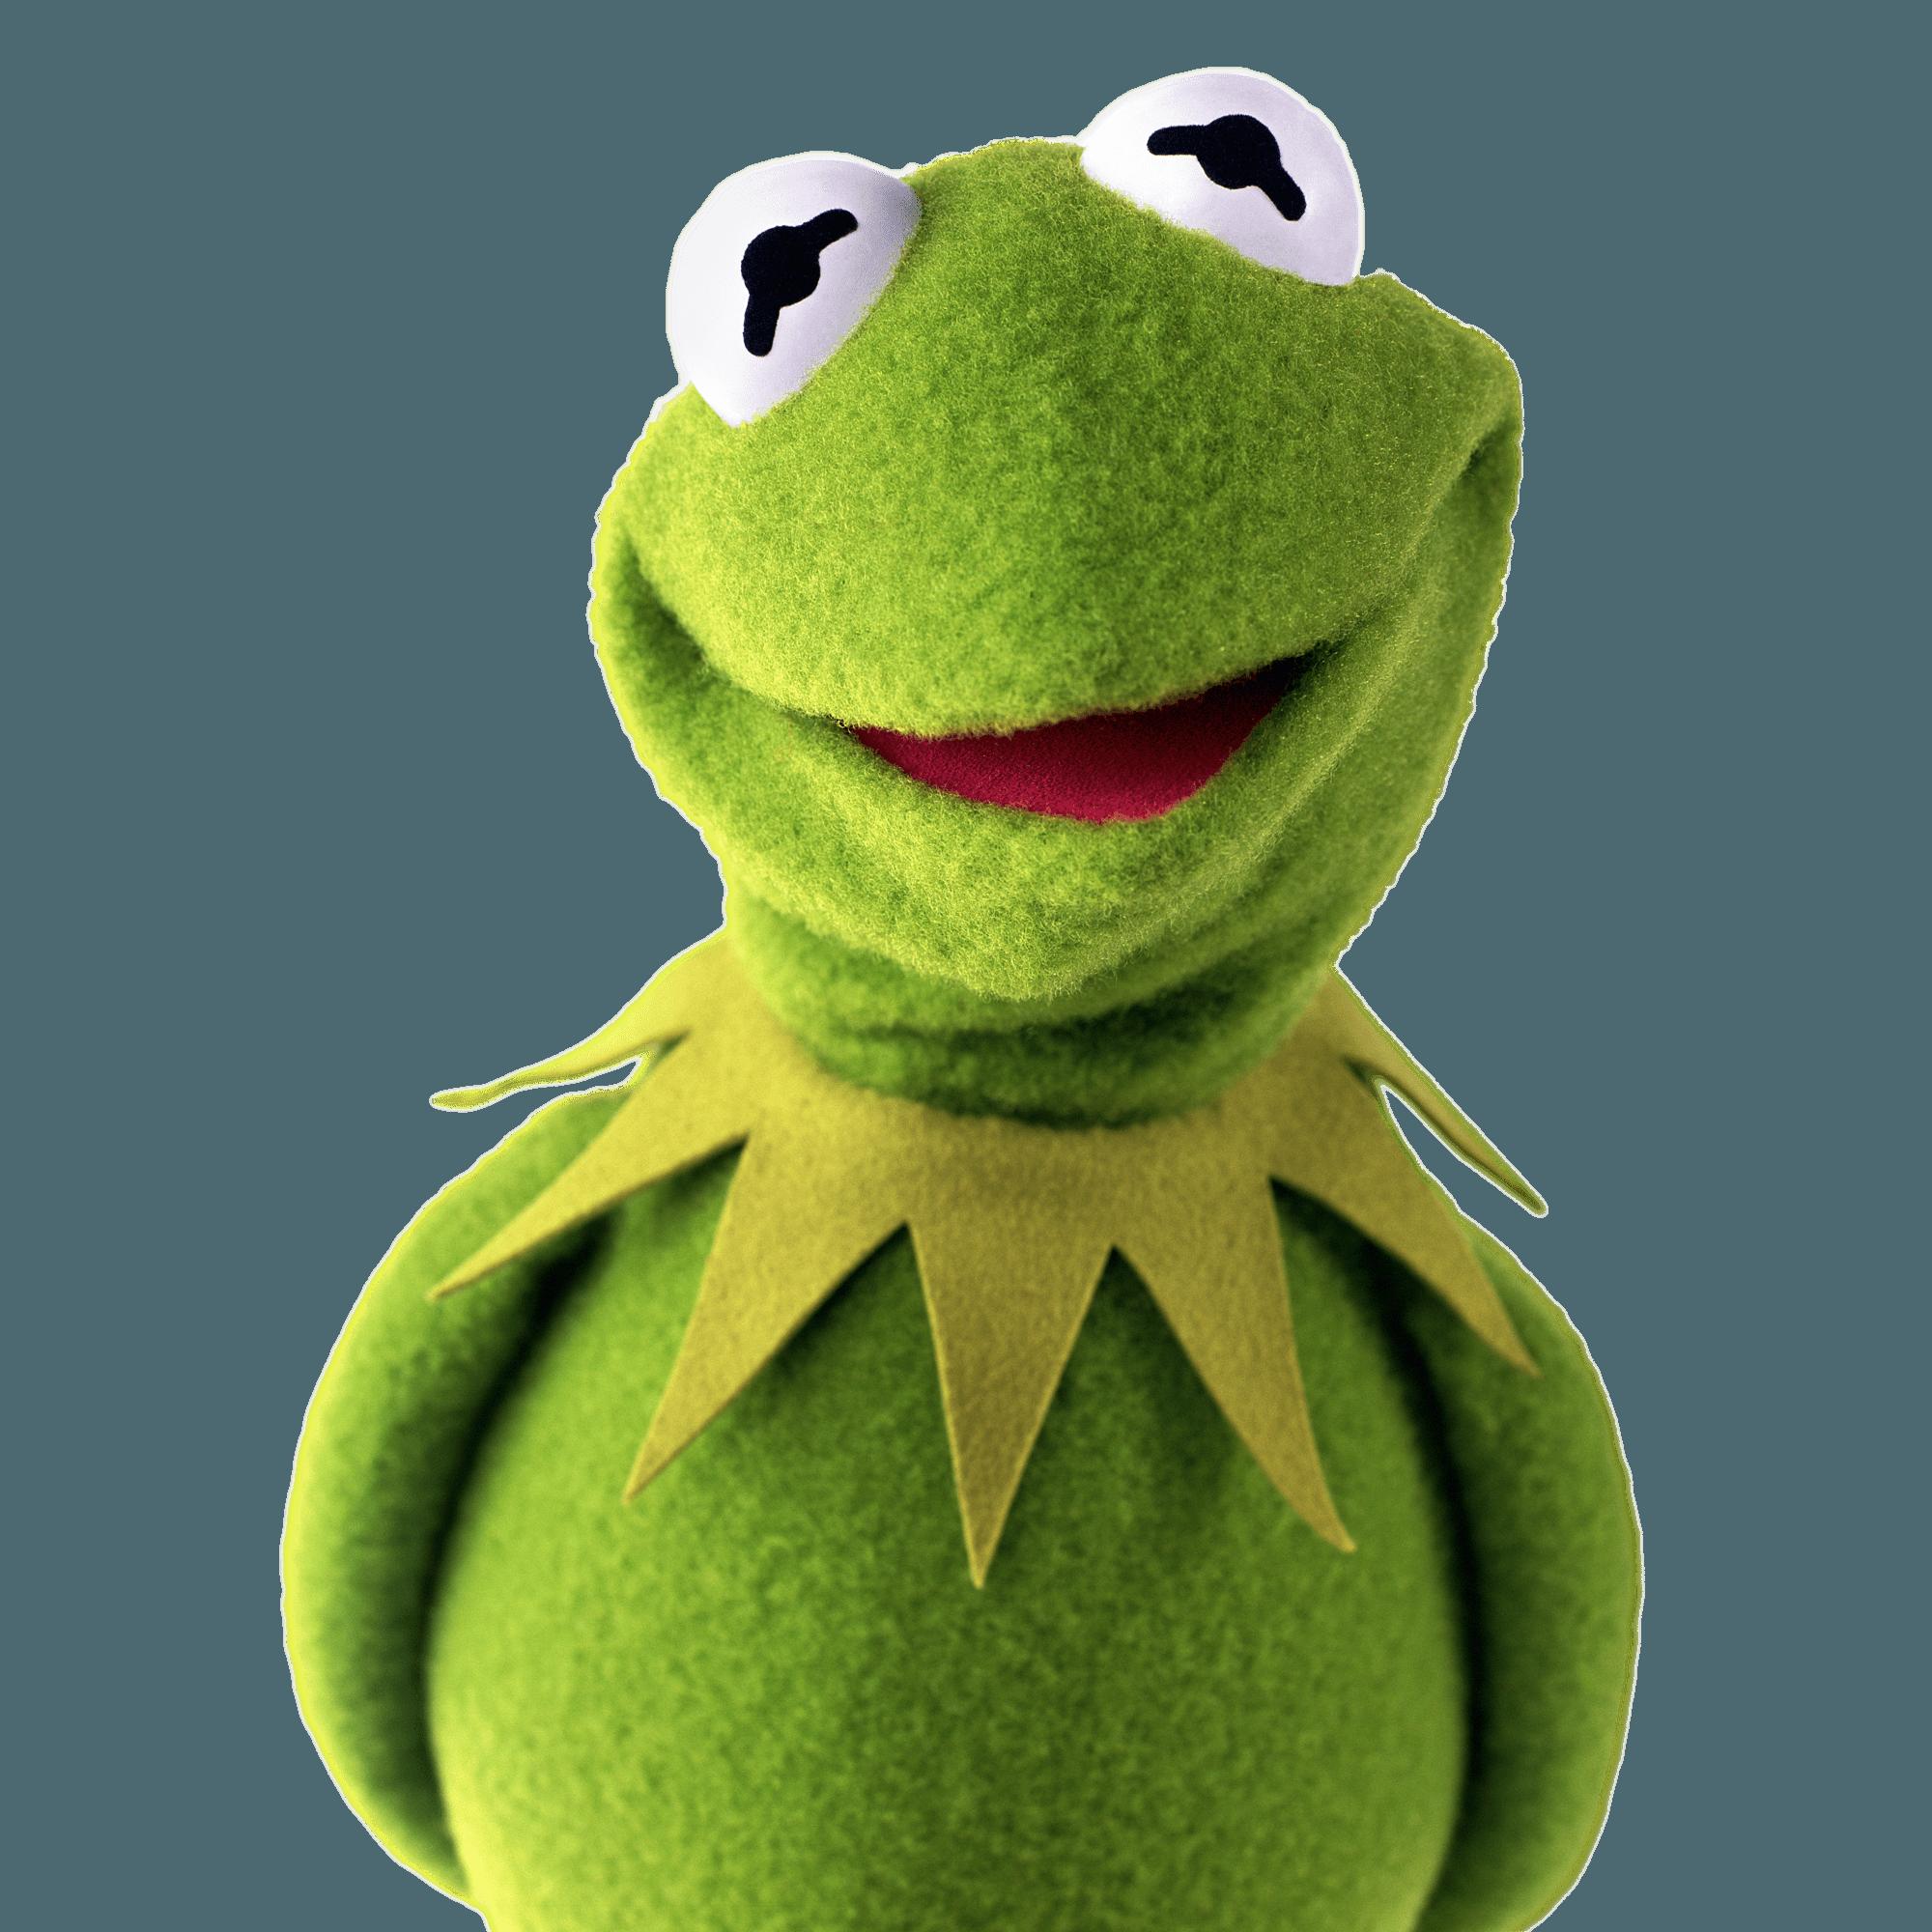 Kermit Meme Background